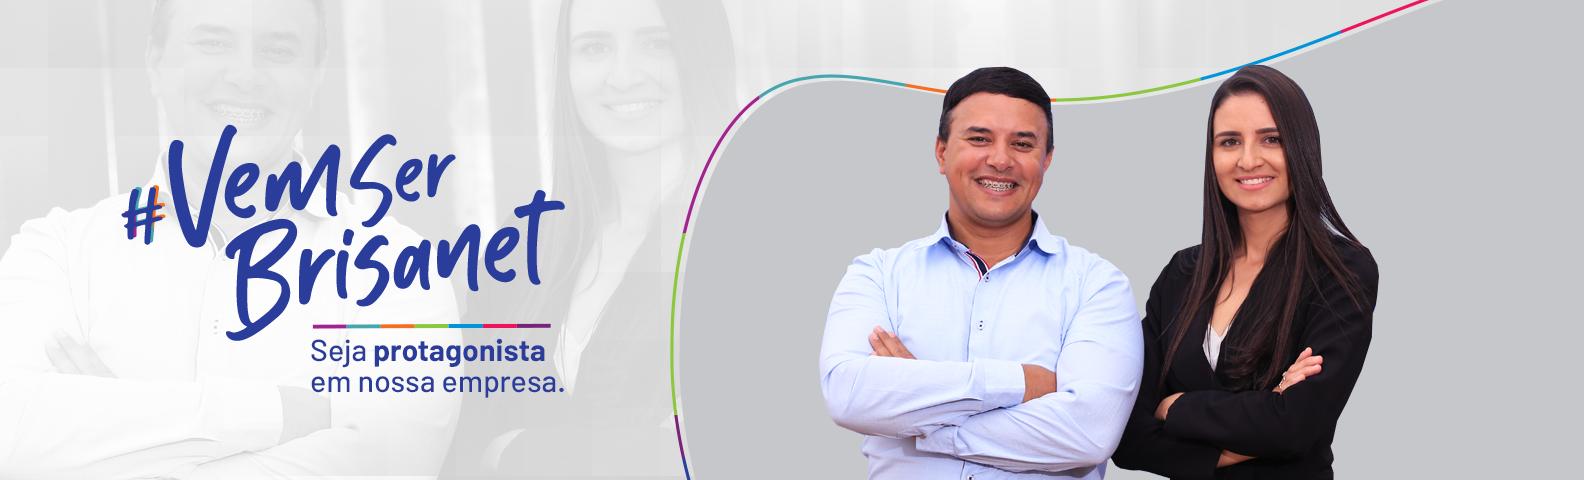 Analista de Recursos Humanos - Business Partner (Fortaleza - CE)